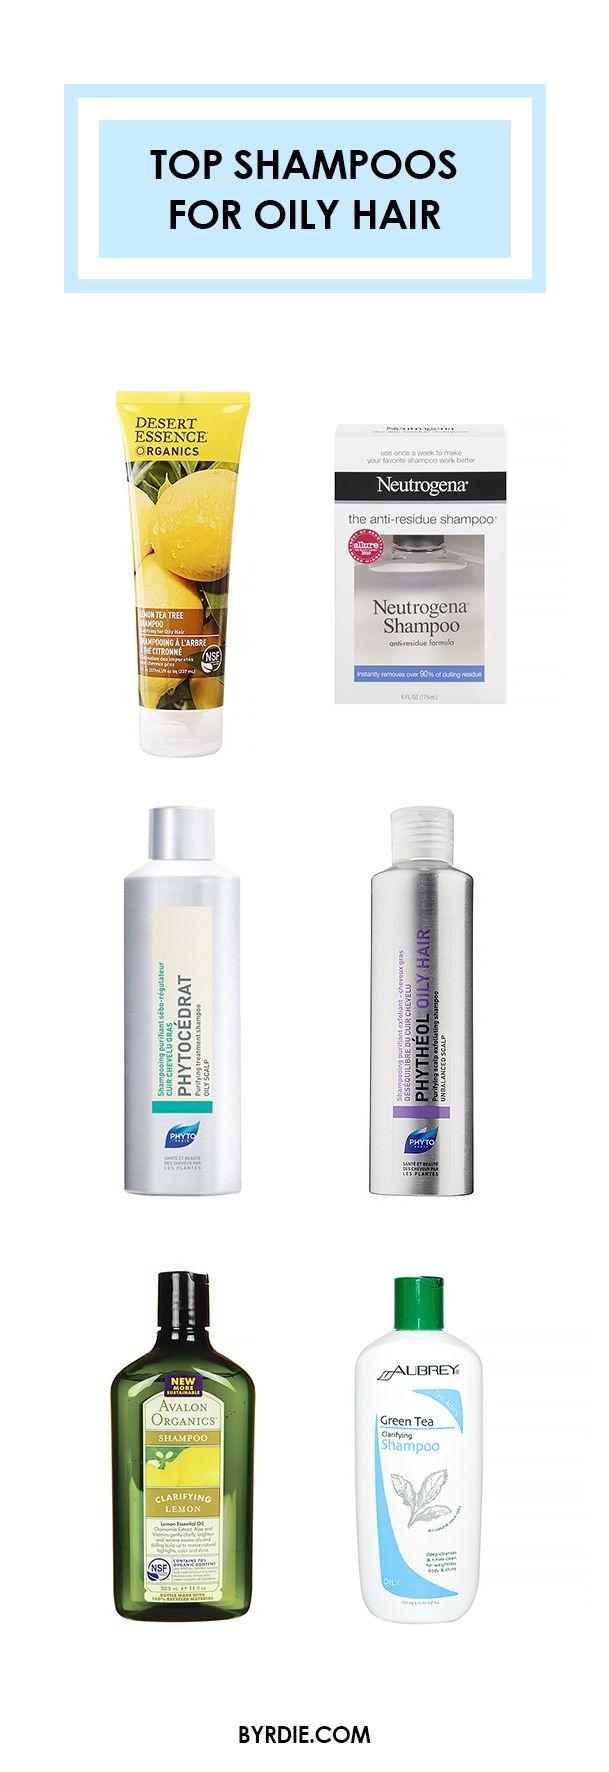 The best shampoos for oily hair